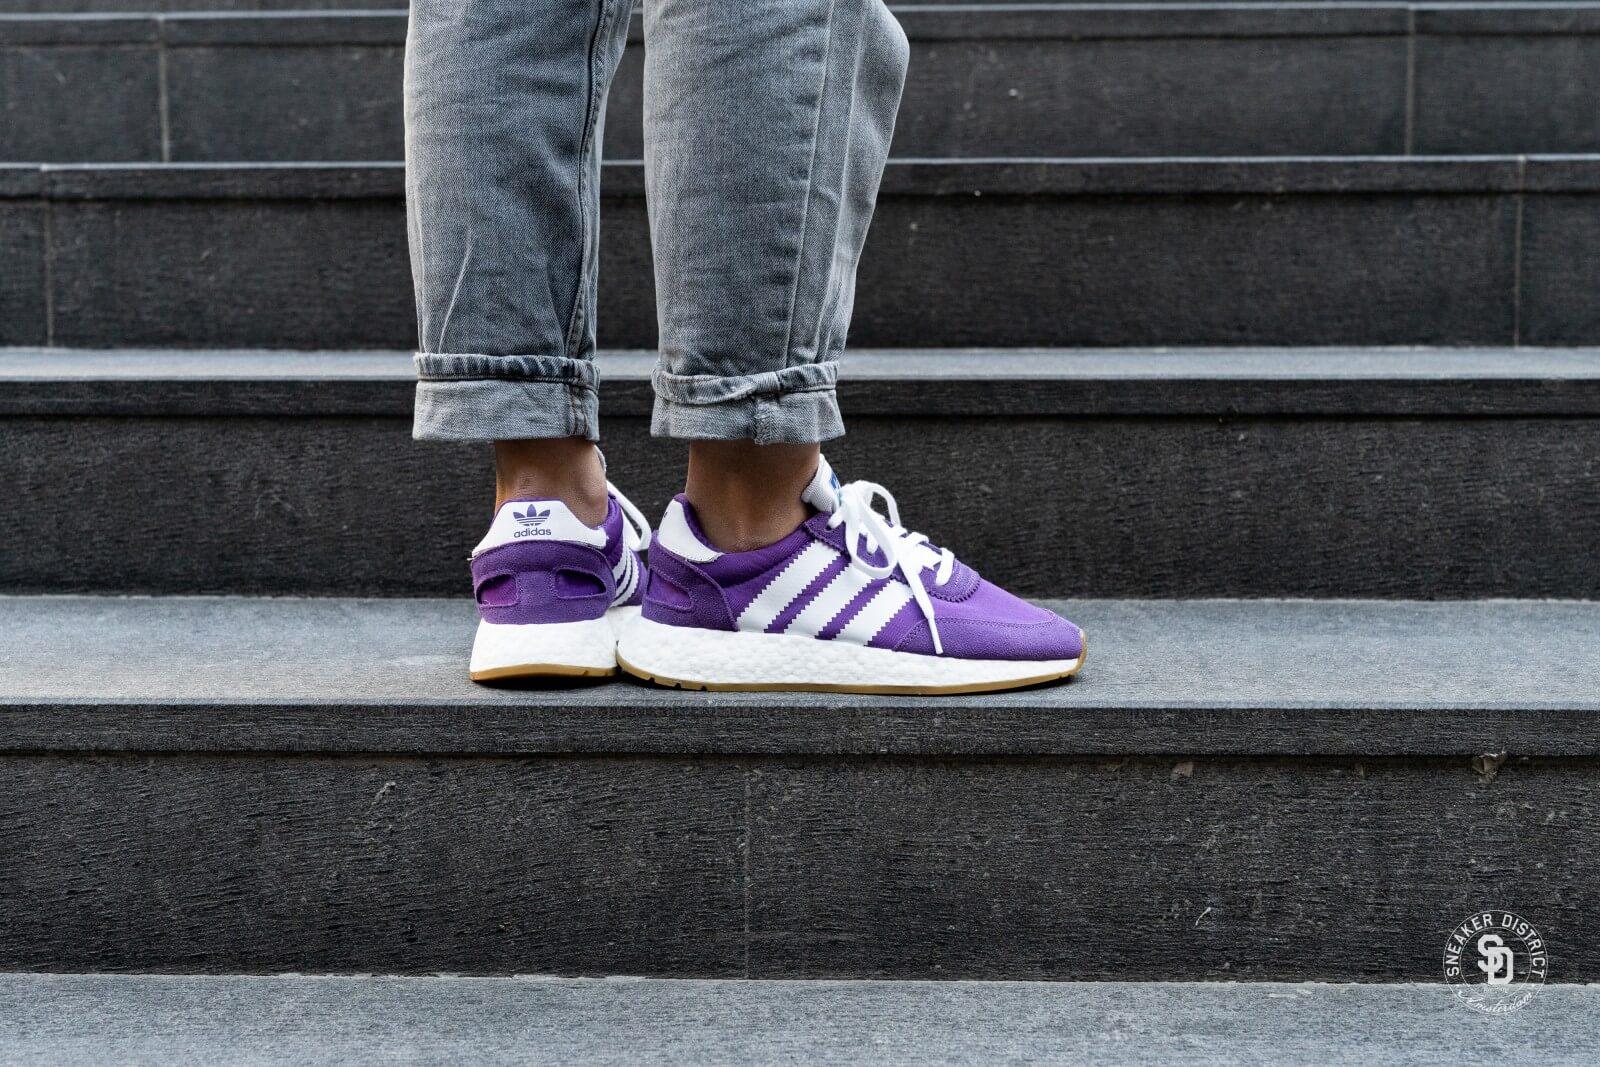 Adidas Women's I-5923 Purple/White - CG6021